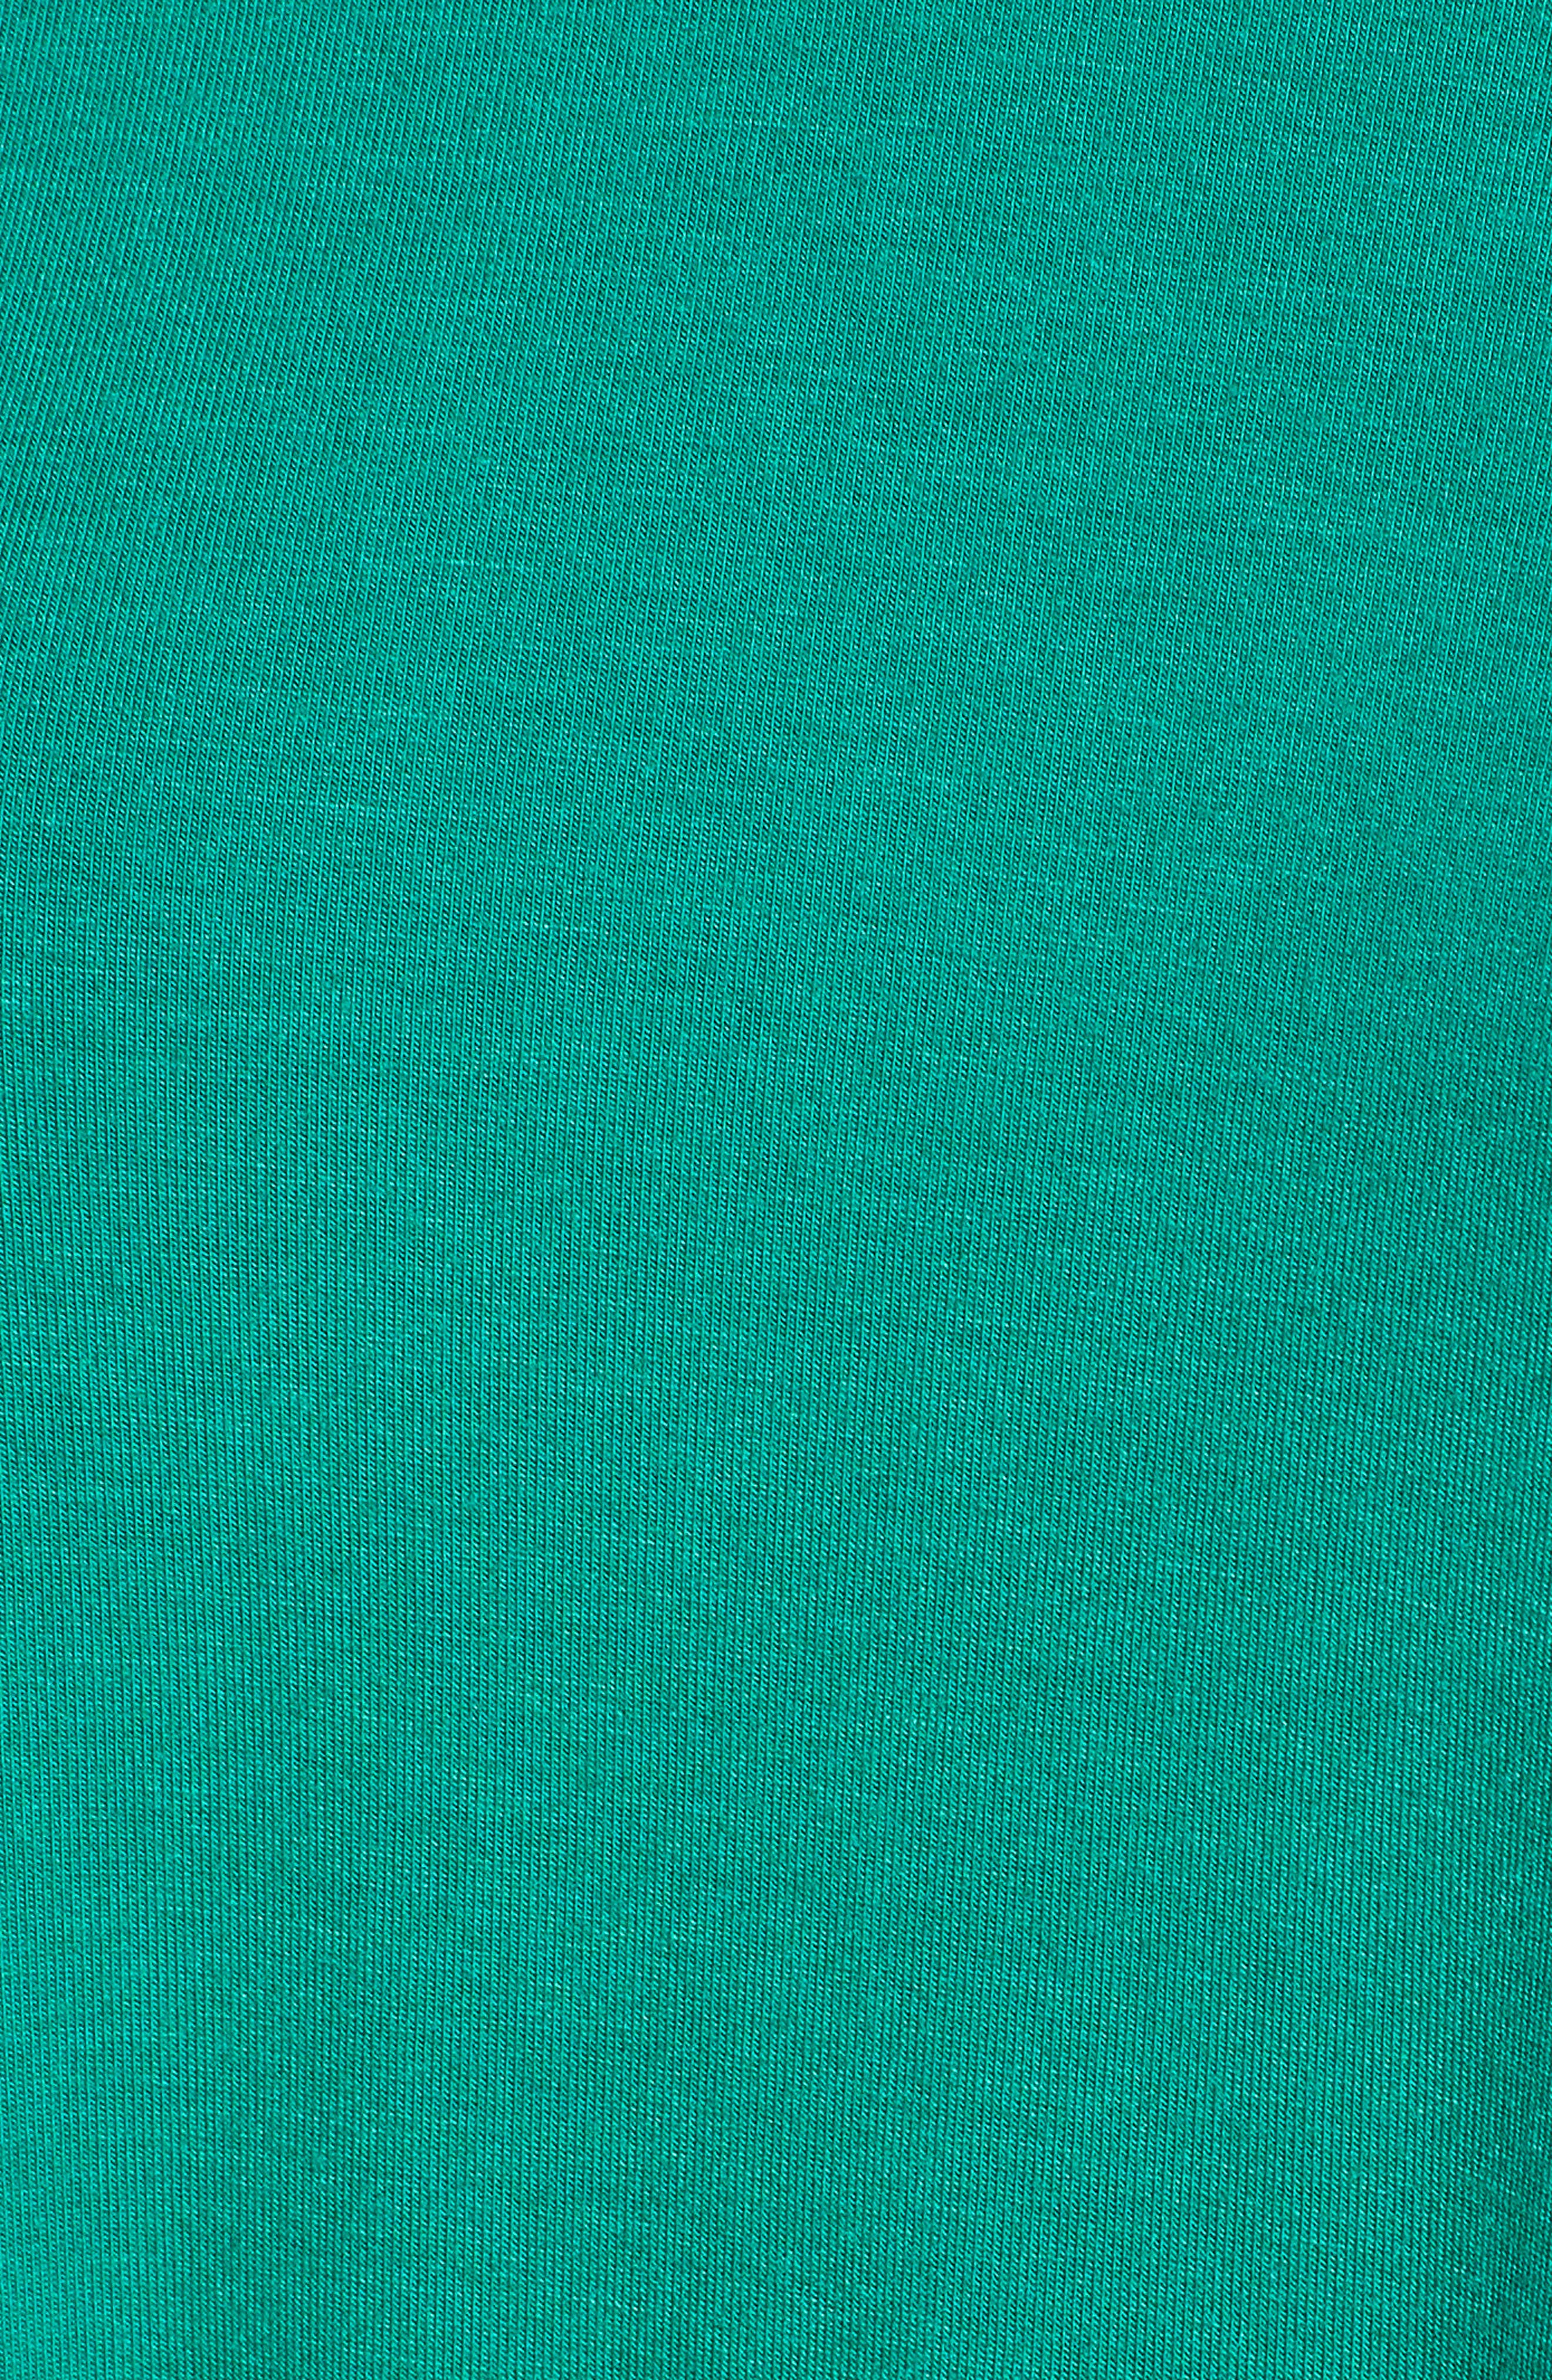 Ruffle Sleeve Tee,                             Alternate thumbnail 5, color,                             Green Pepper